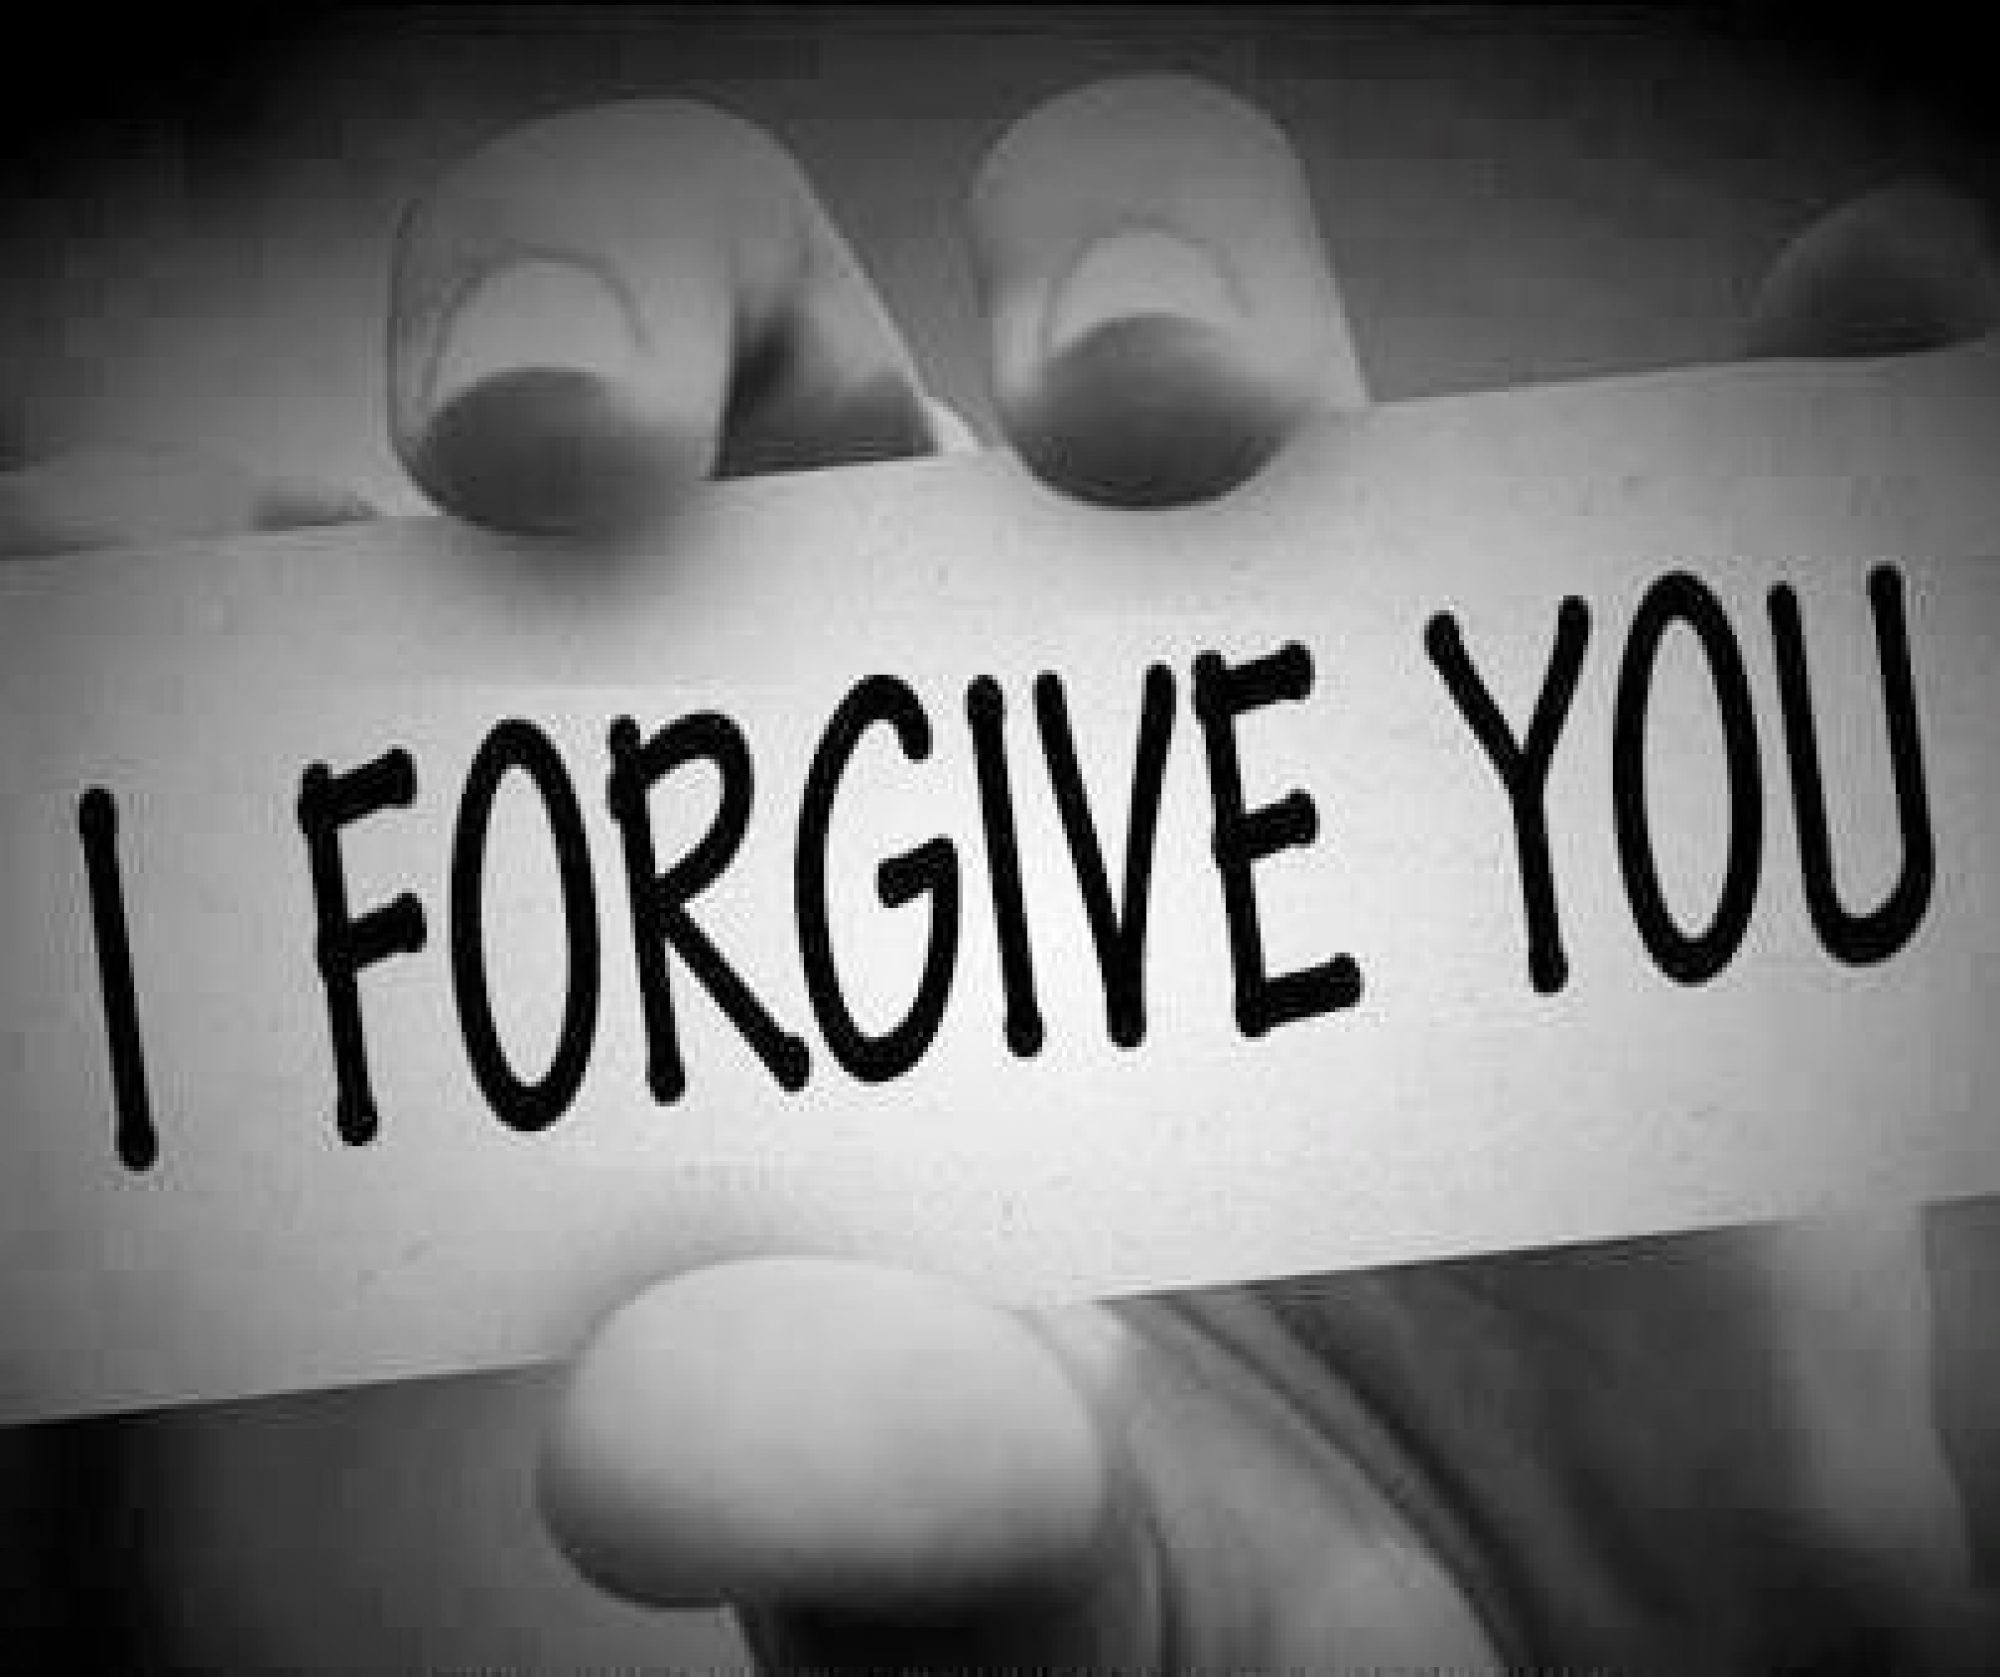 True Forgiveness: Finding Heaven's Gate